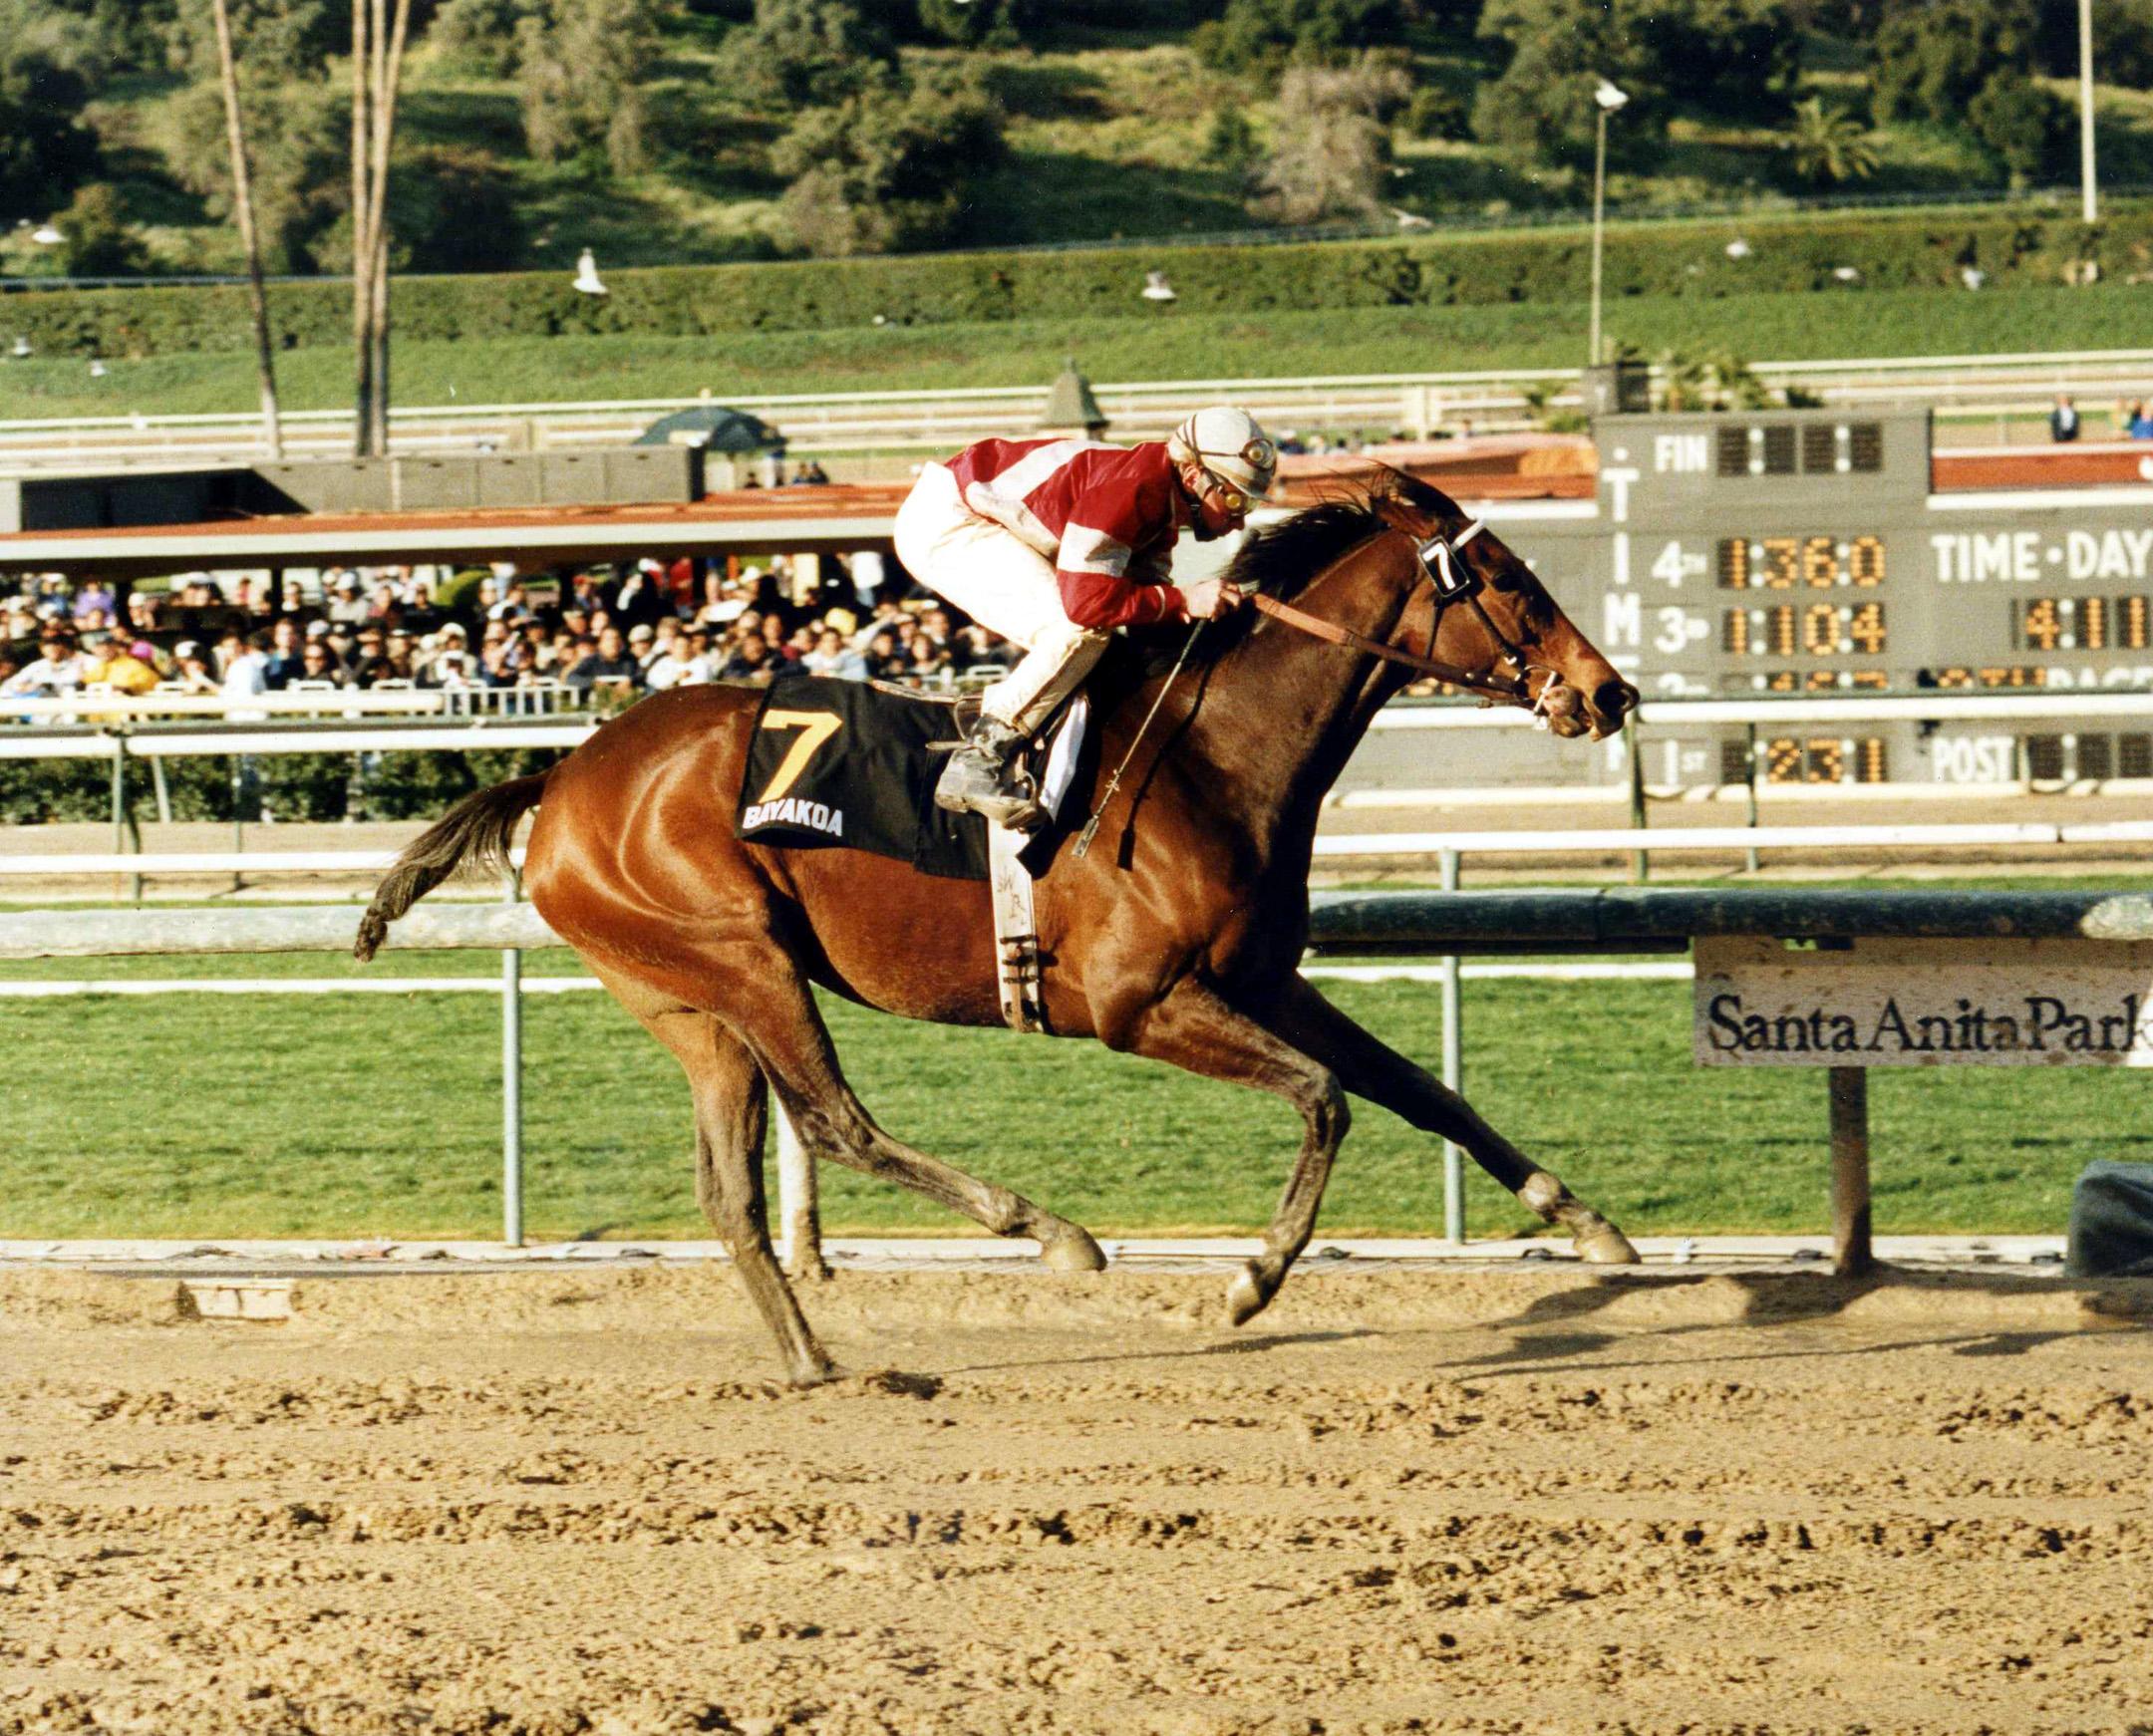 Bayakoa (Laffit Pincay, Jr. up) winning the 1989 Santa Margarita Handicap at Santa Anita Park (Santa Anita Photo/Museum Collection)